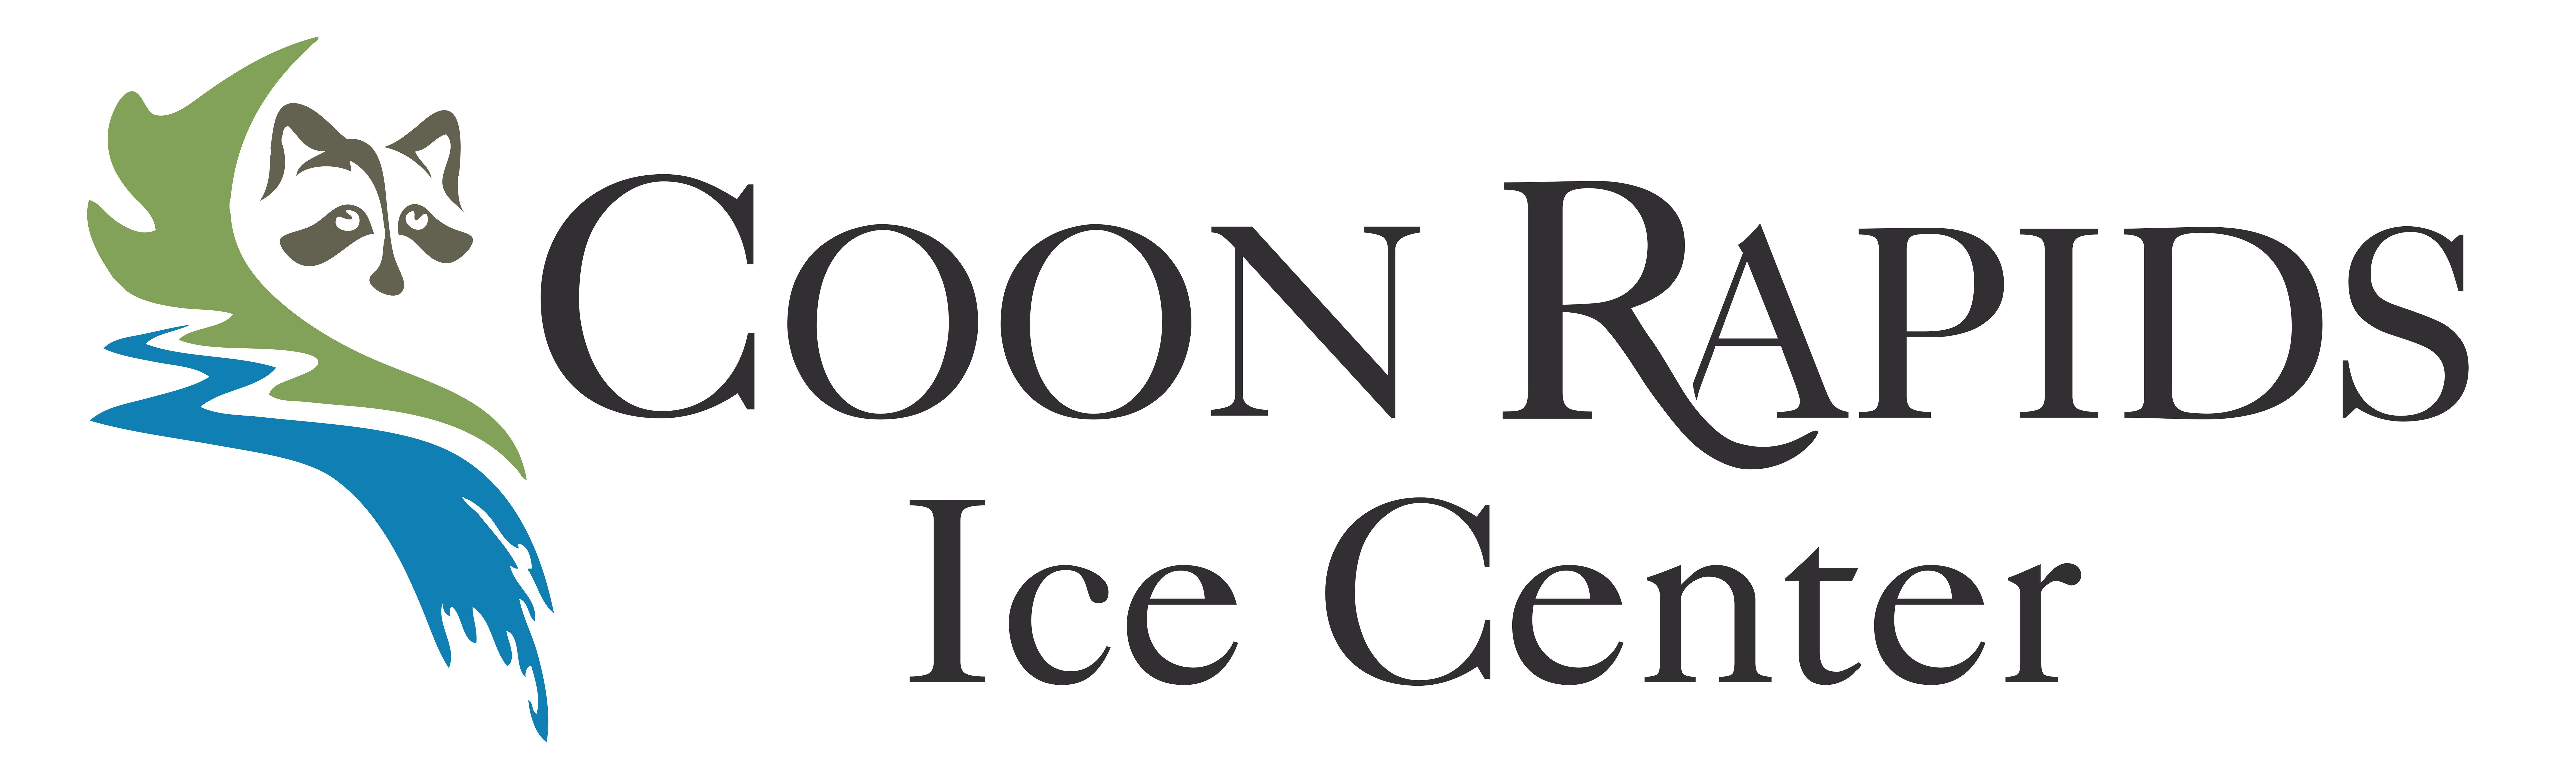 Coon Rapids Ice Center